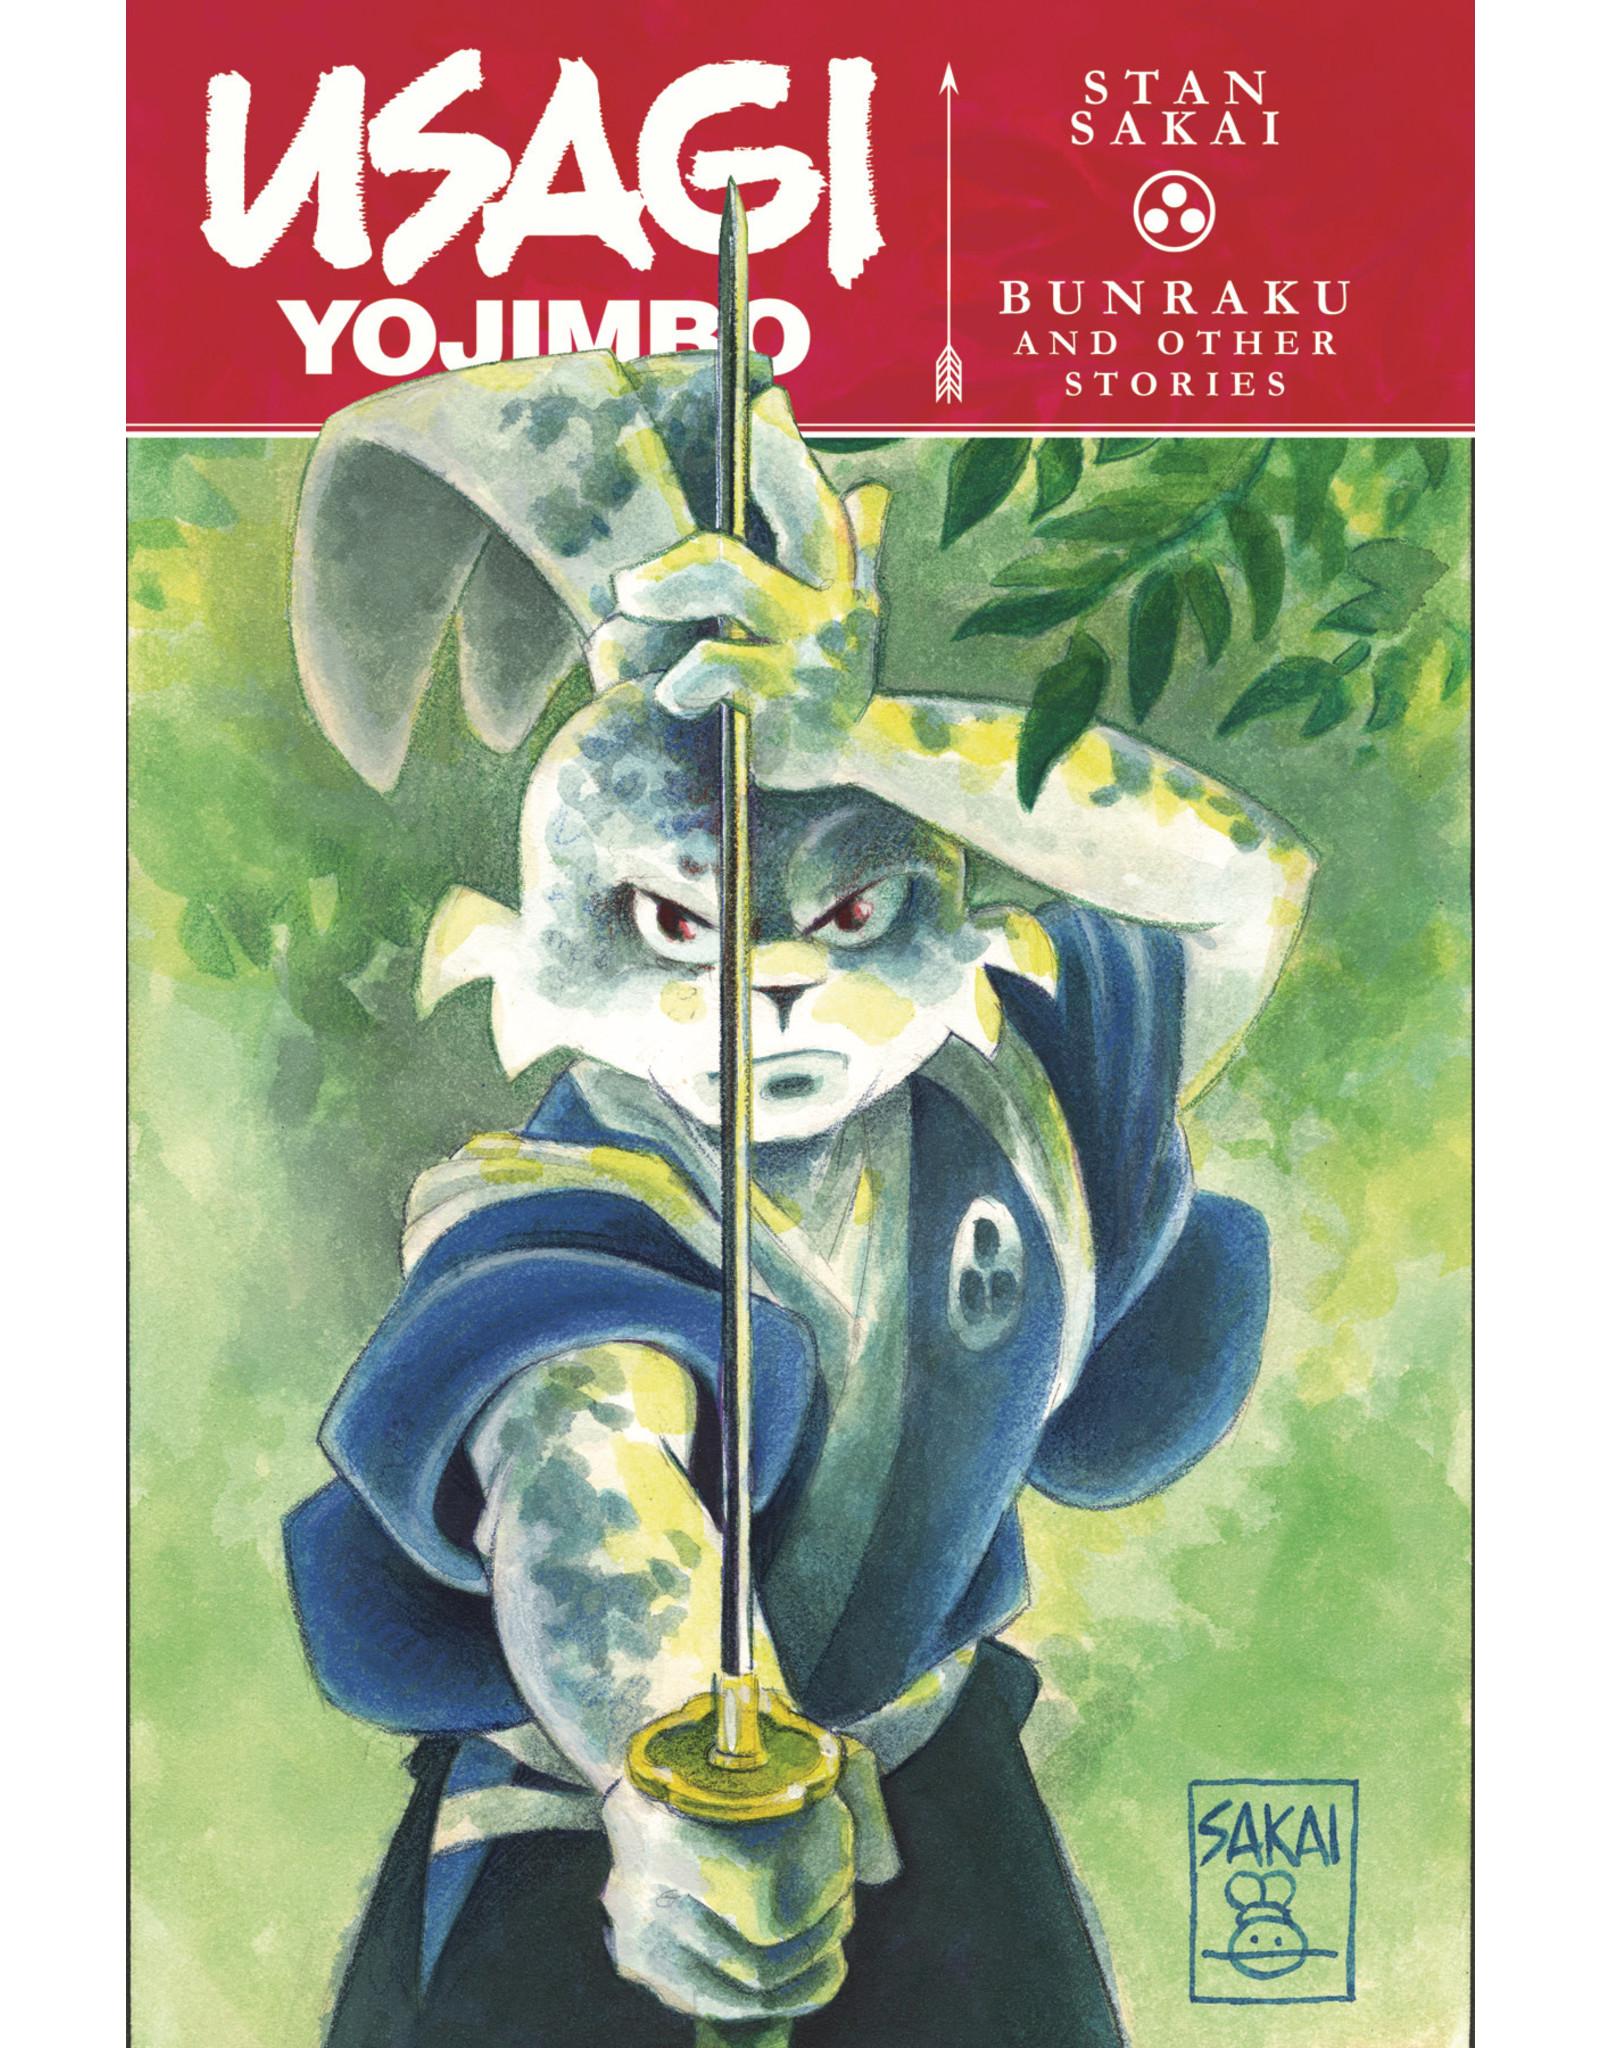 IDW PUBLISHING USAGI YOJIMBO TP VOL 01 BUNRAKU & OTHER STORIES